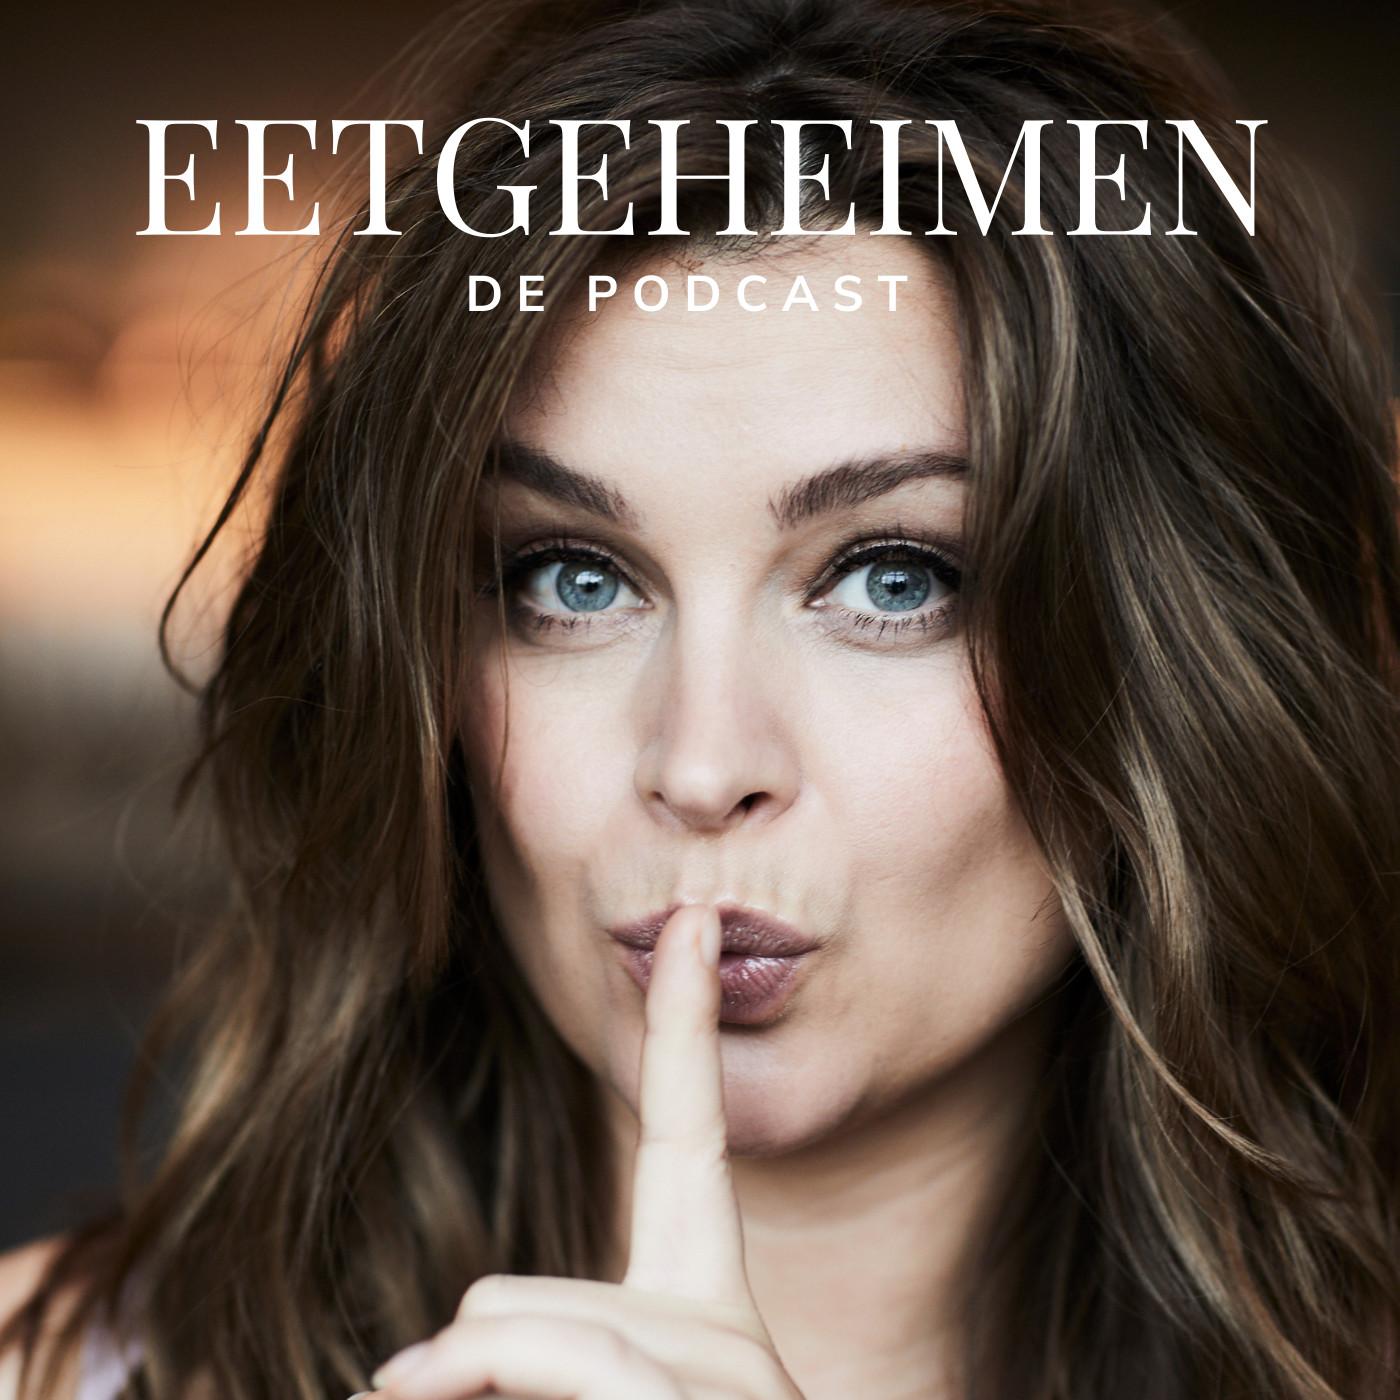 Eetgeheimen - De Podcast [Trailer]